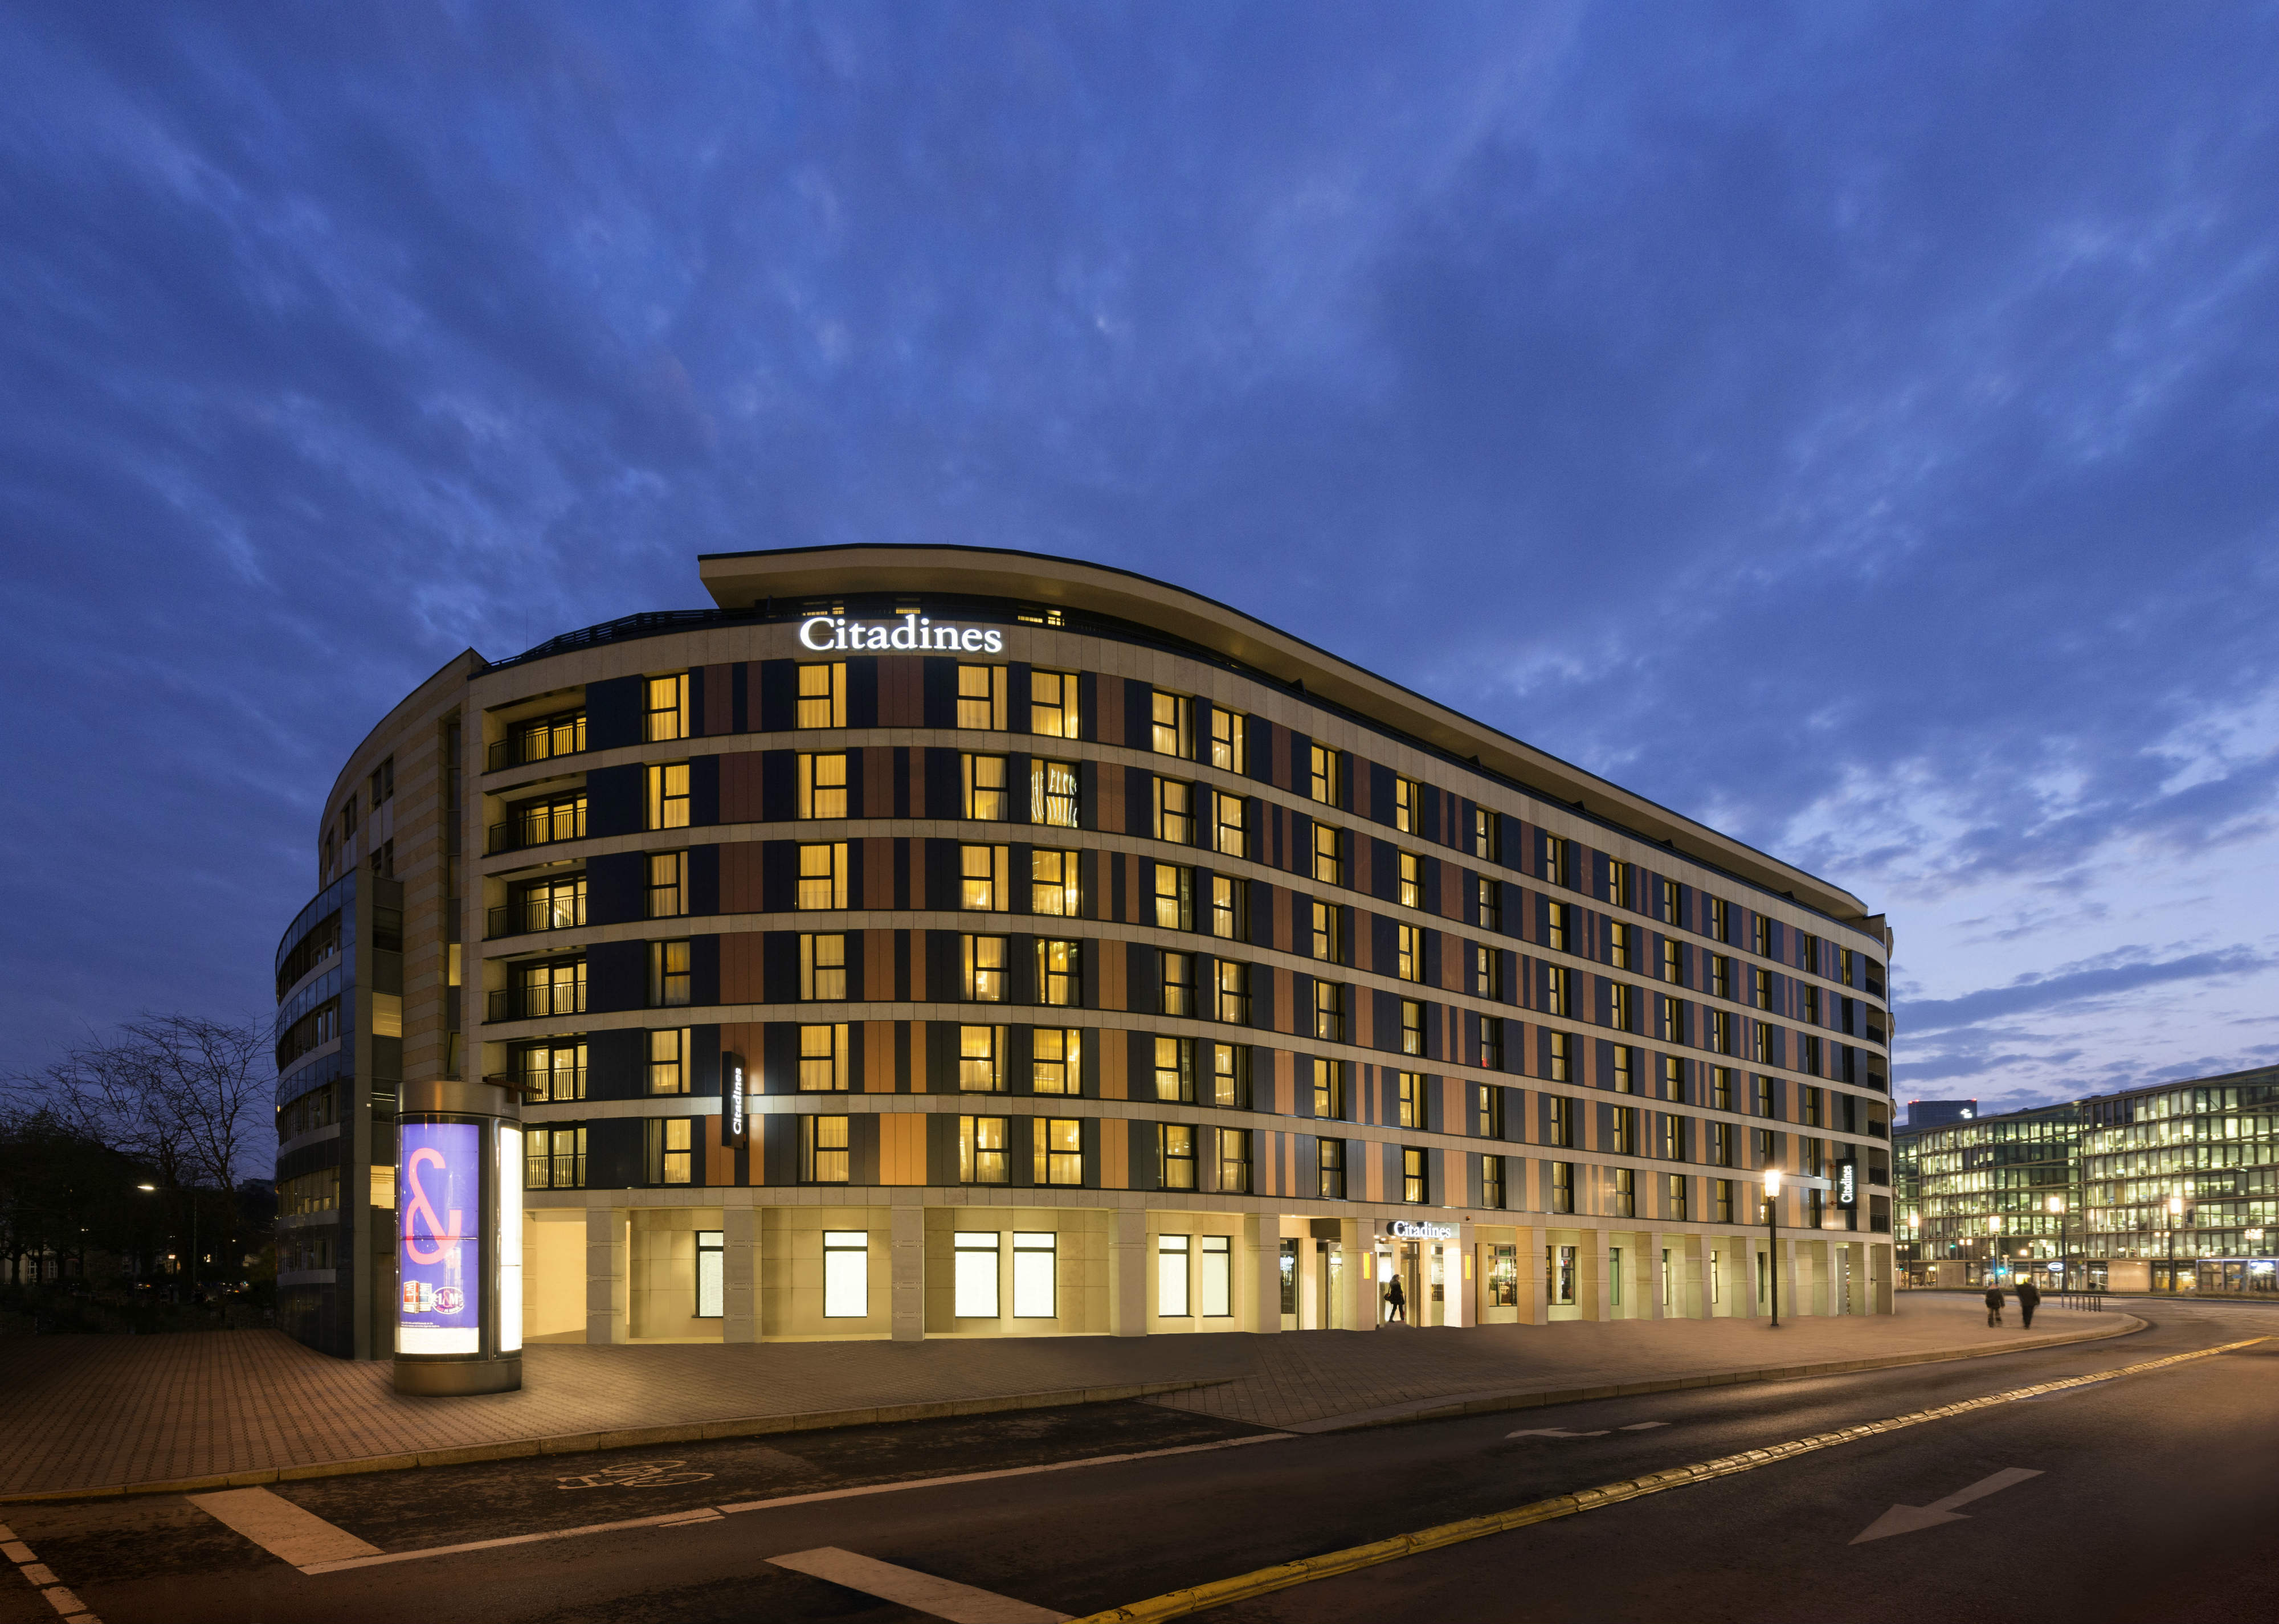 Ascott Residence Trust's Citadines City Centre Frankfurt. (Photo: Ascott Residence Trust)